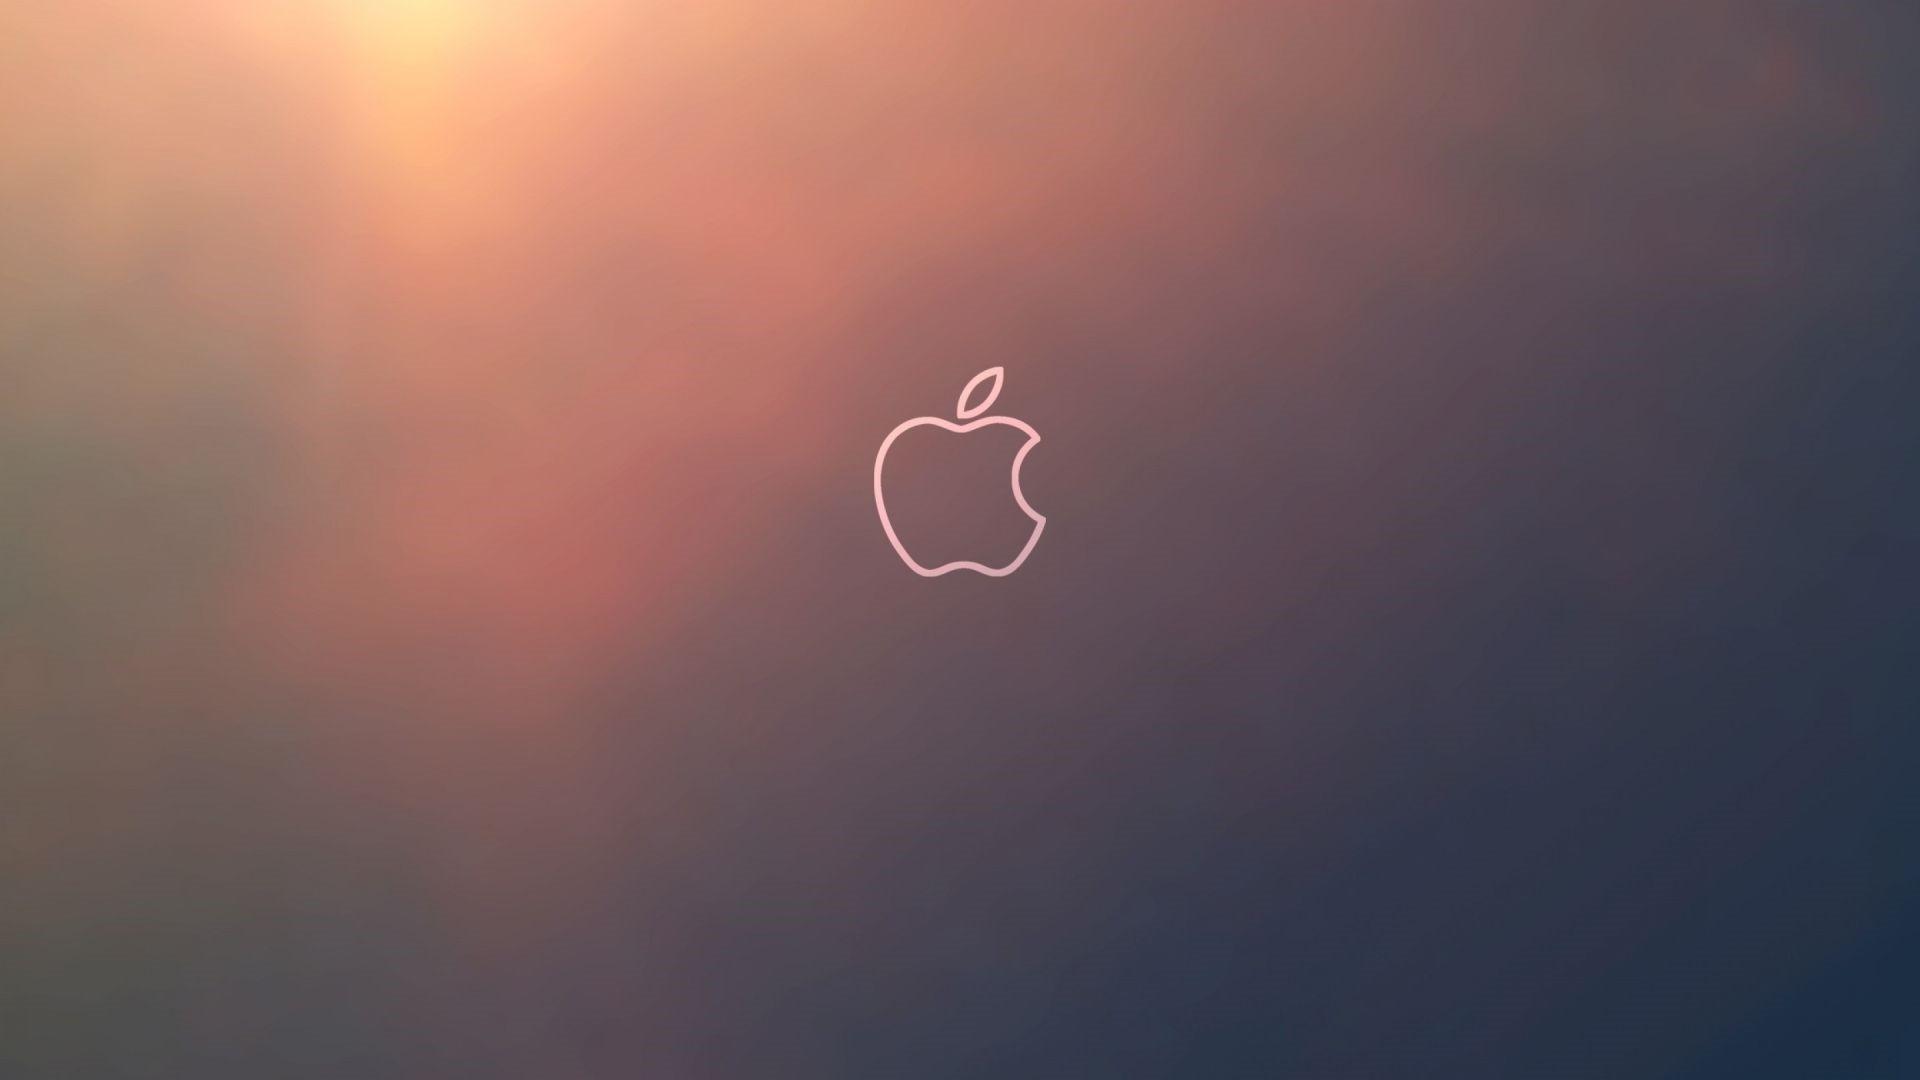 Macbook Air computer wallpaper